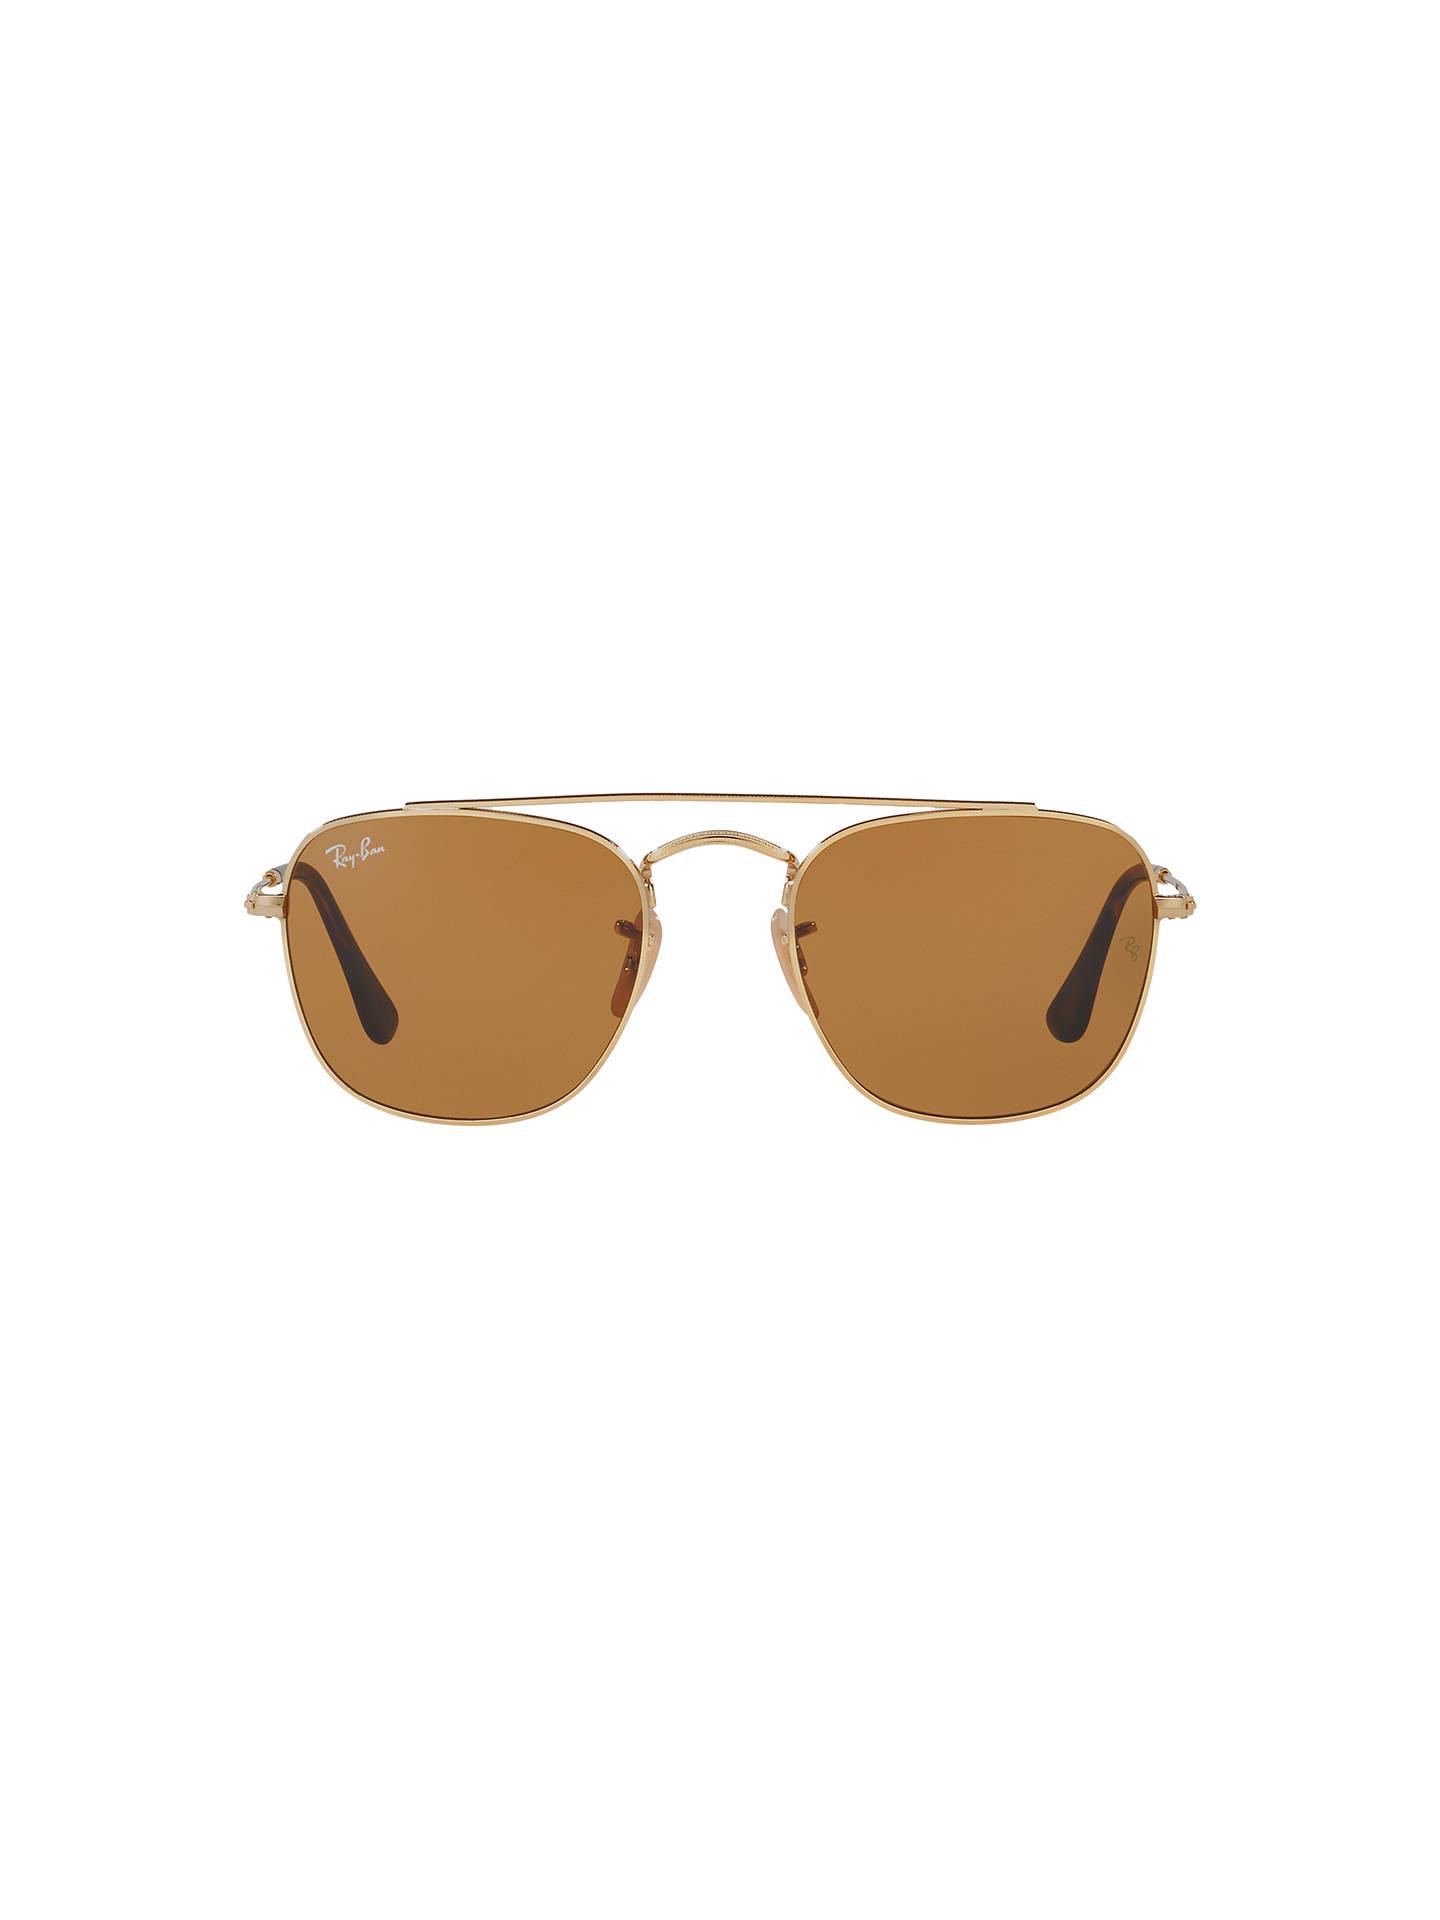 9cc34925a59 ... BuyRay-Ban RB3557 Square Sunglasses